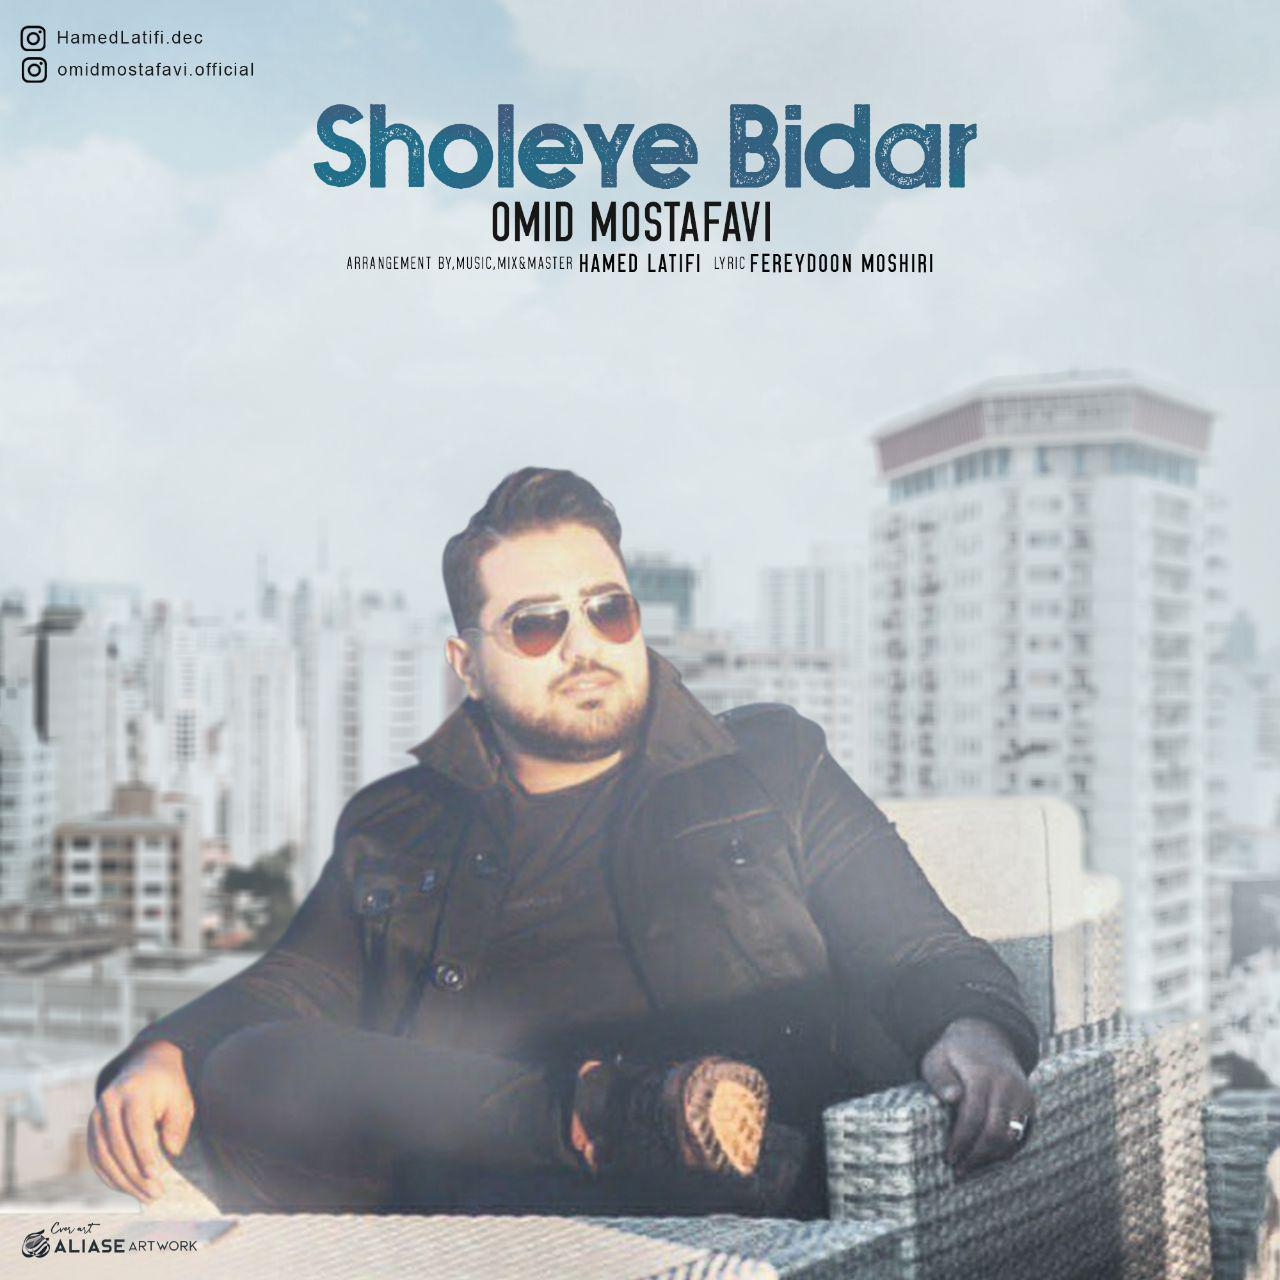 Omid Mostafavi – Sholeye Bidar